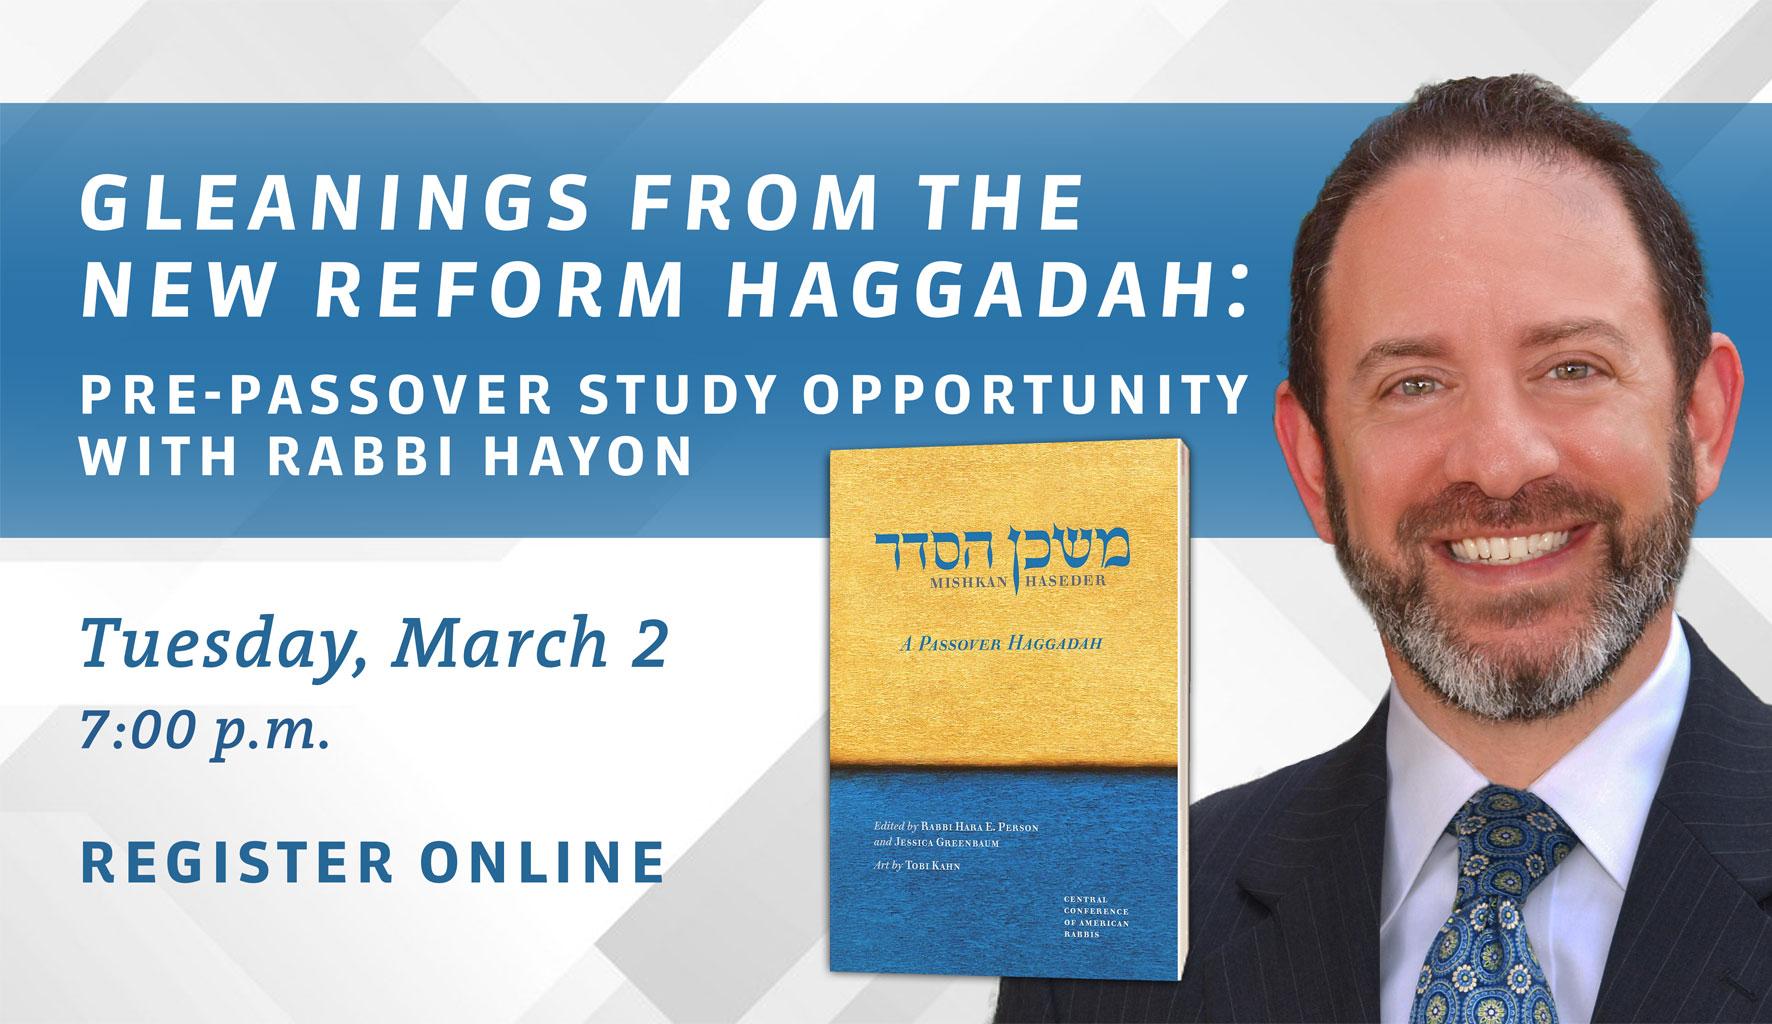 pre-passover study